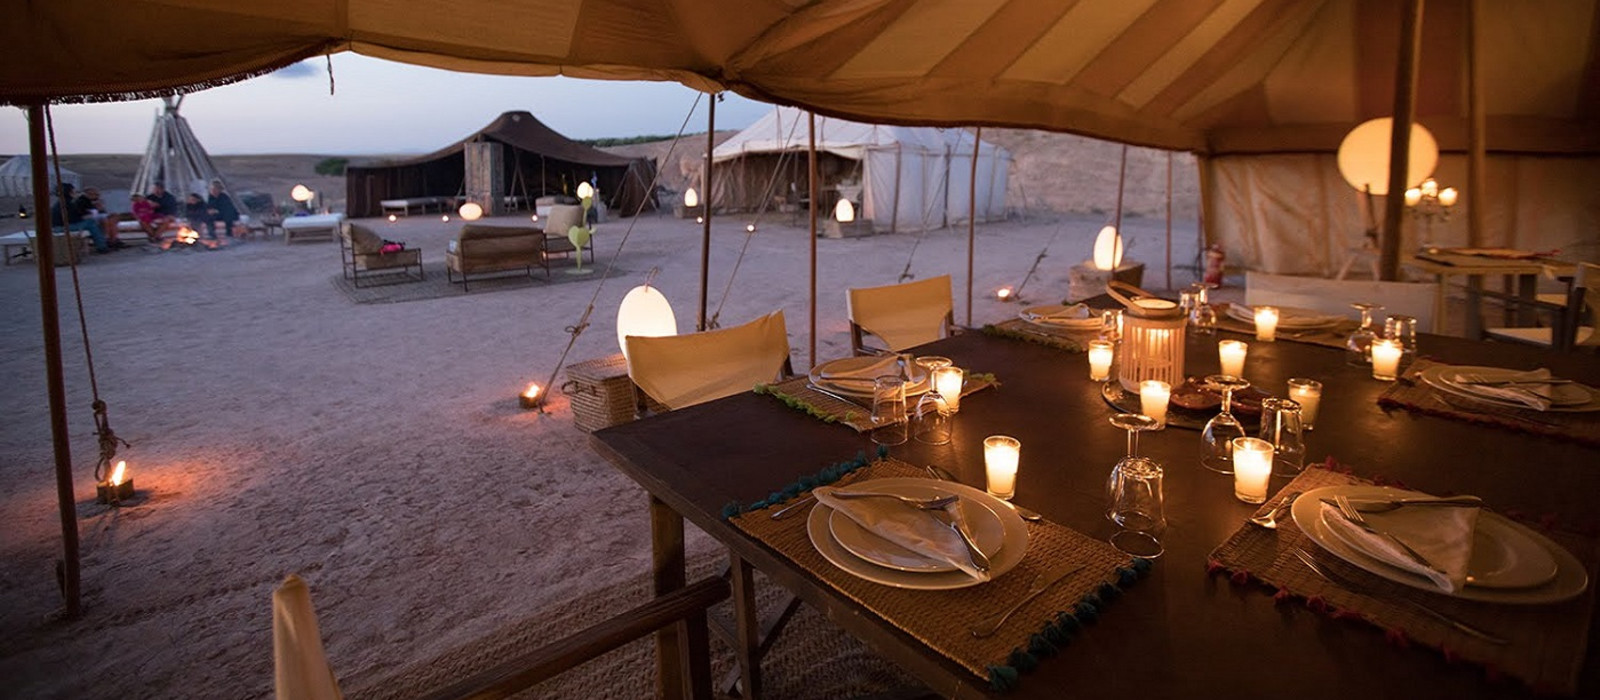 Hotel Inara Camp Morocco